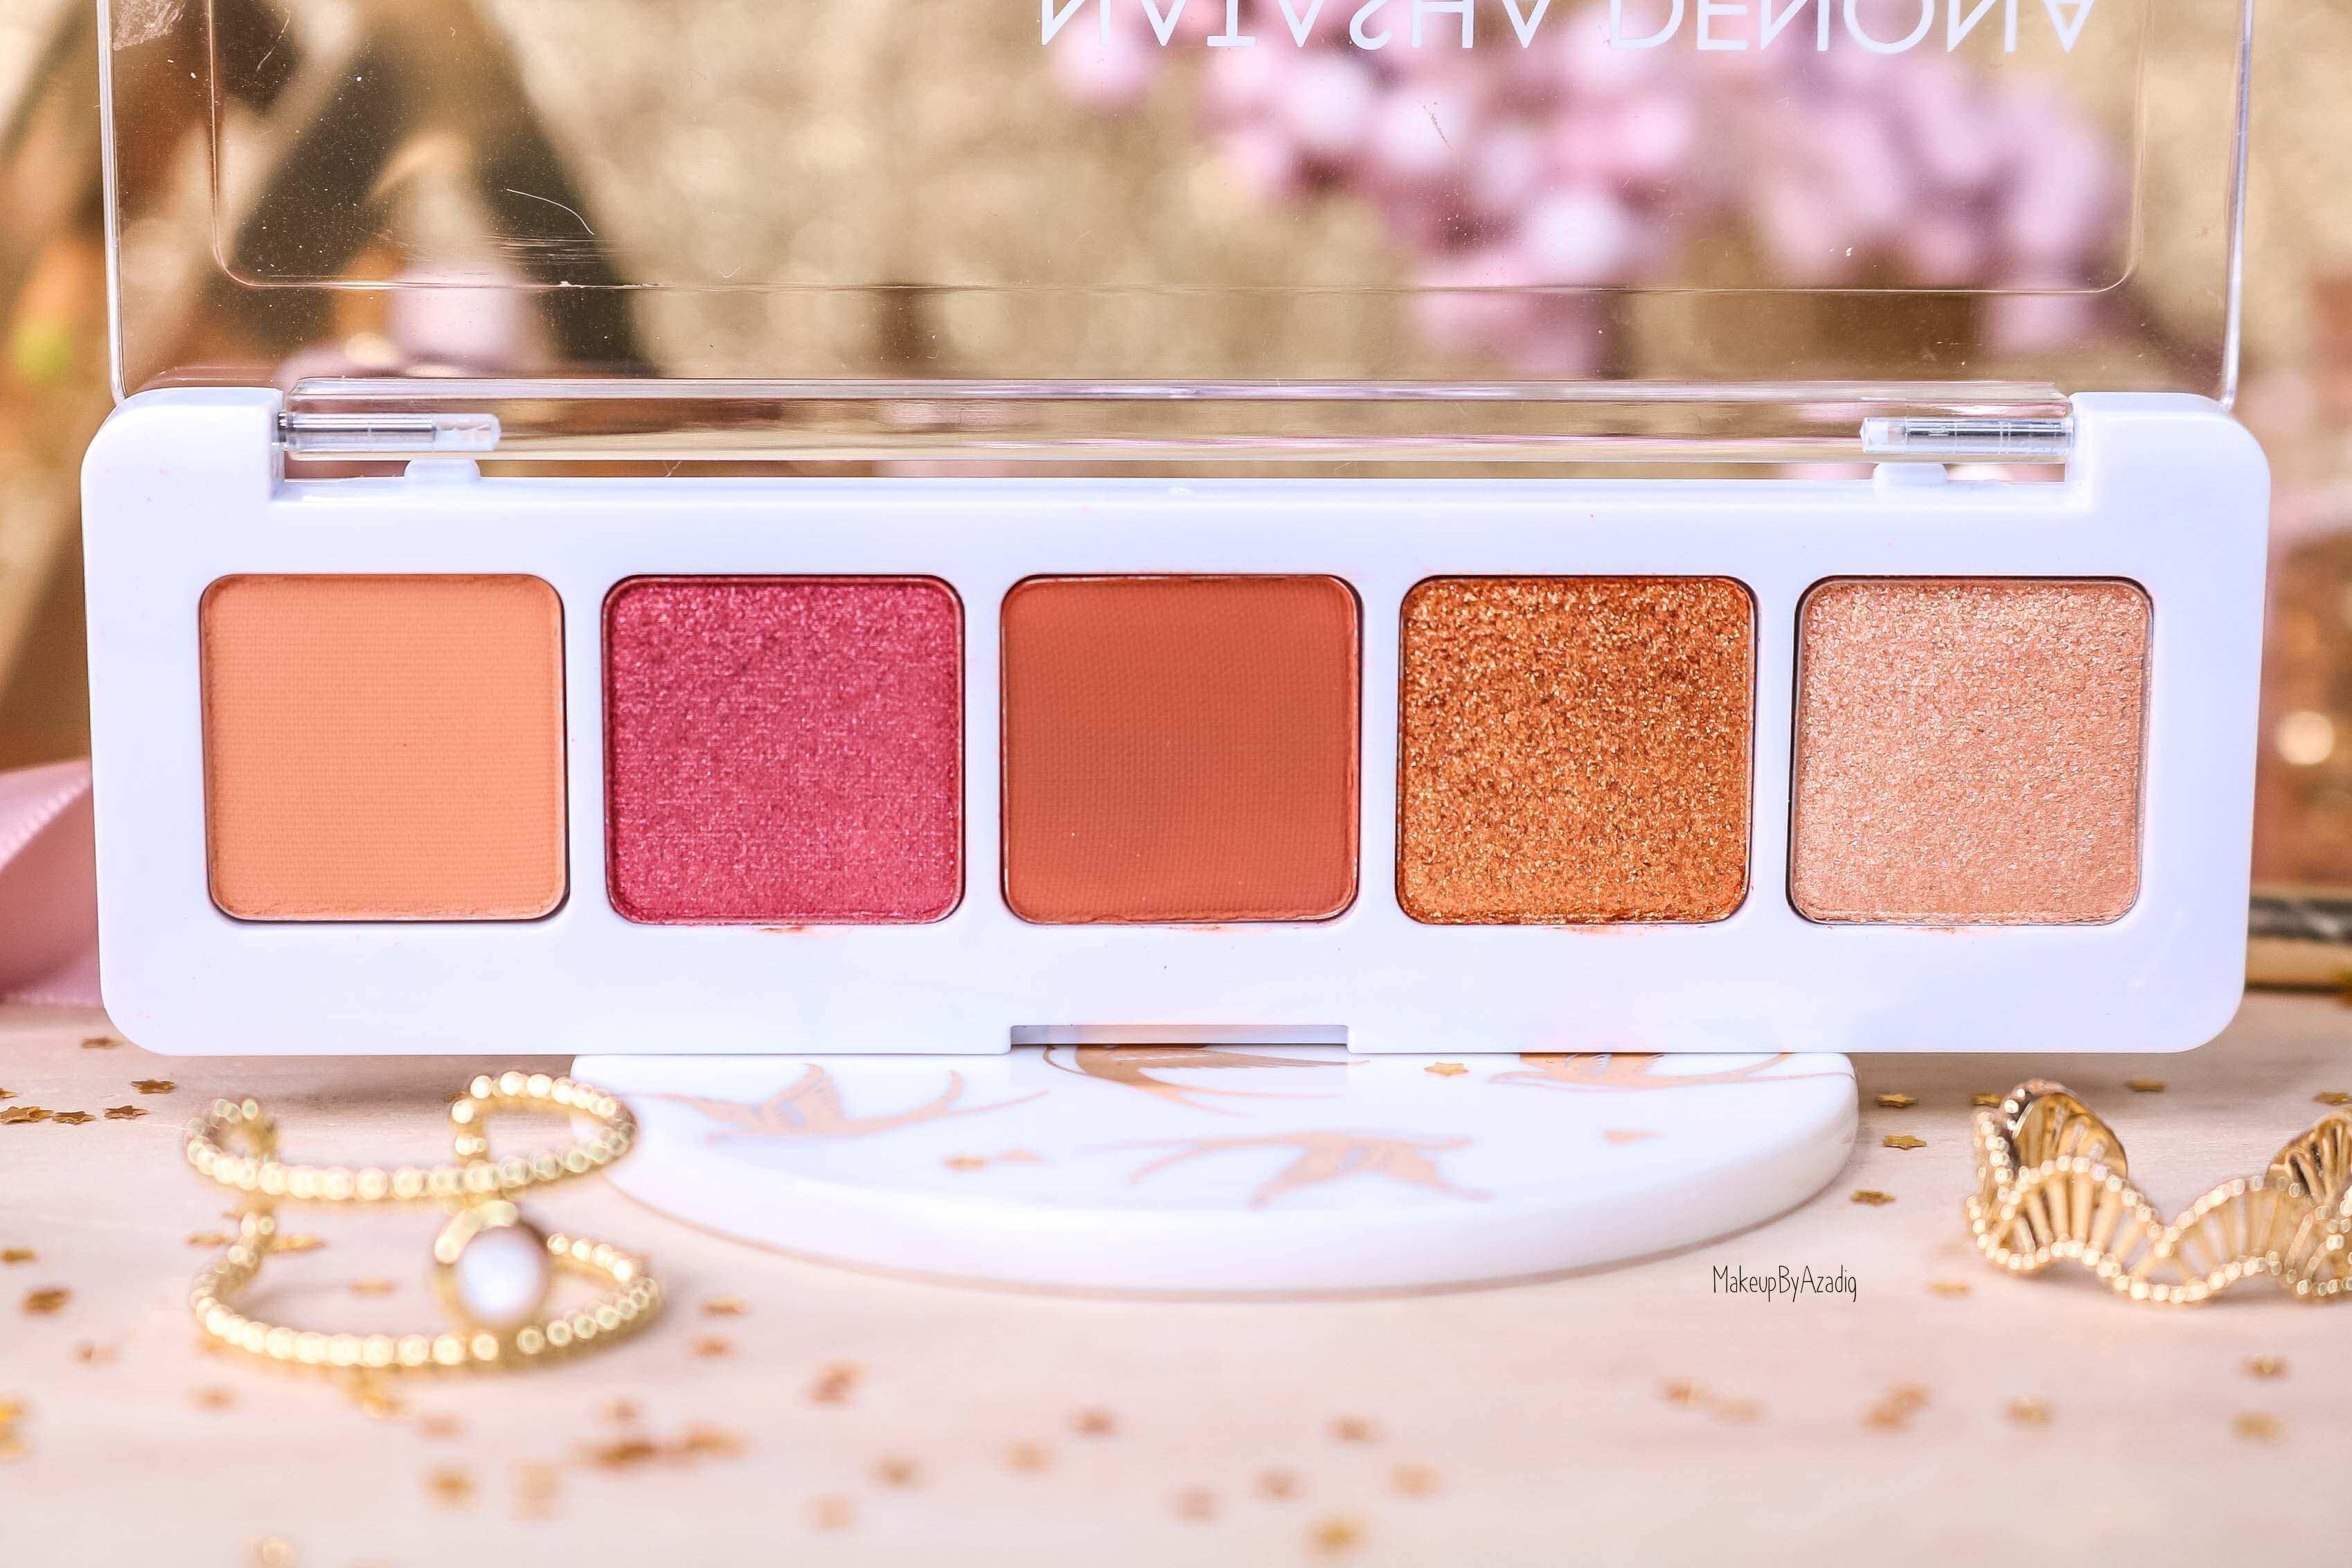 revue-palette-mini-sunset-natasha-denona-sephora-france-avis-prix-swatch-gold-champagne-burgundy-makeupbyazadig-eyeshadow-zoom